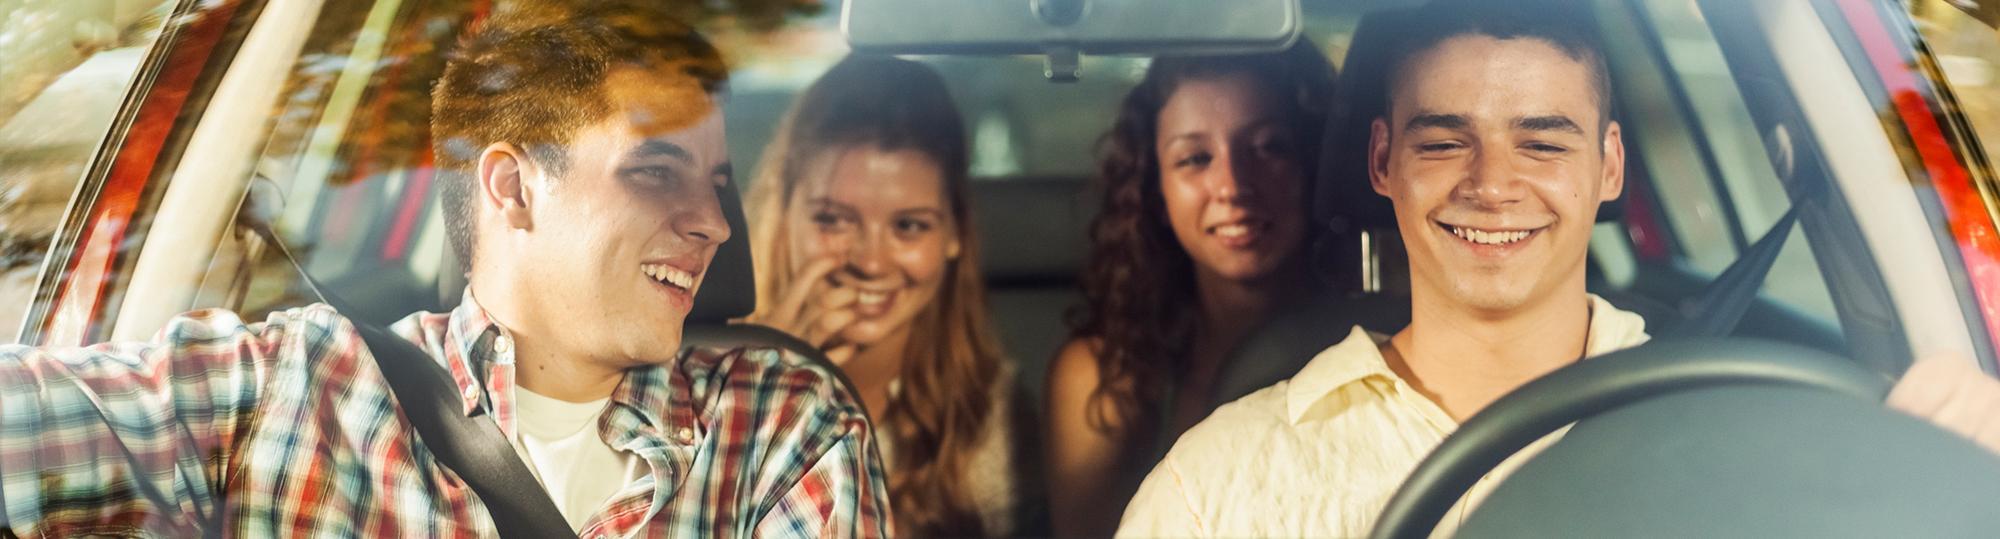 avis car sales deal hero teens driving new car